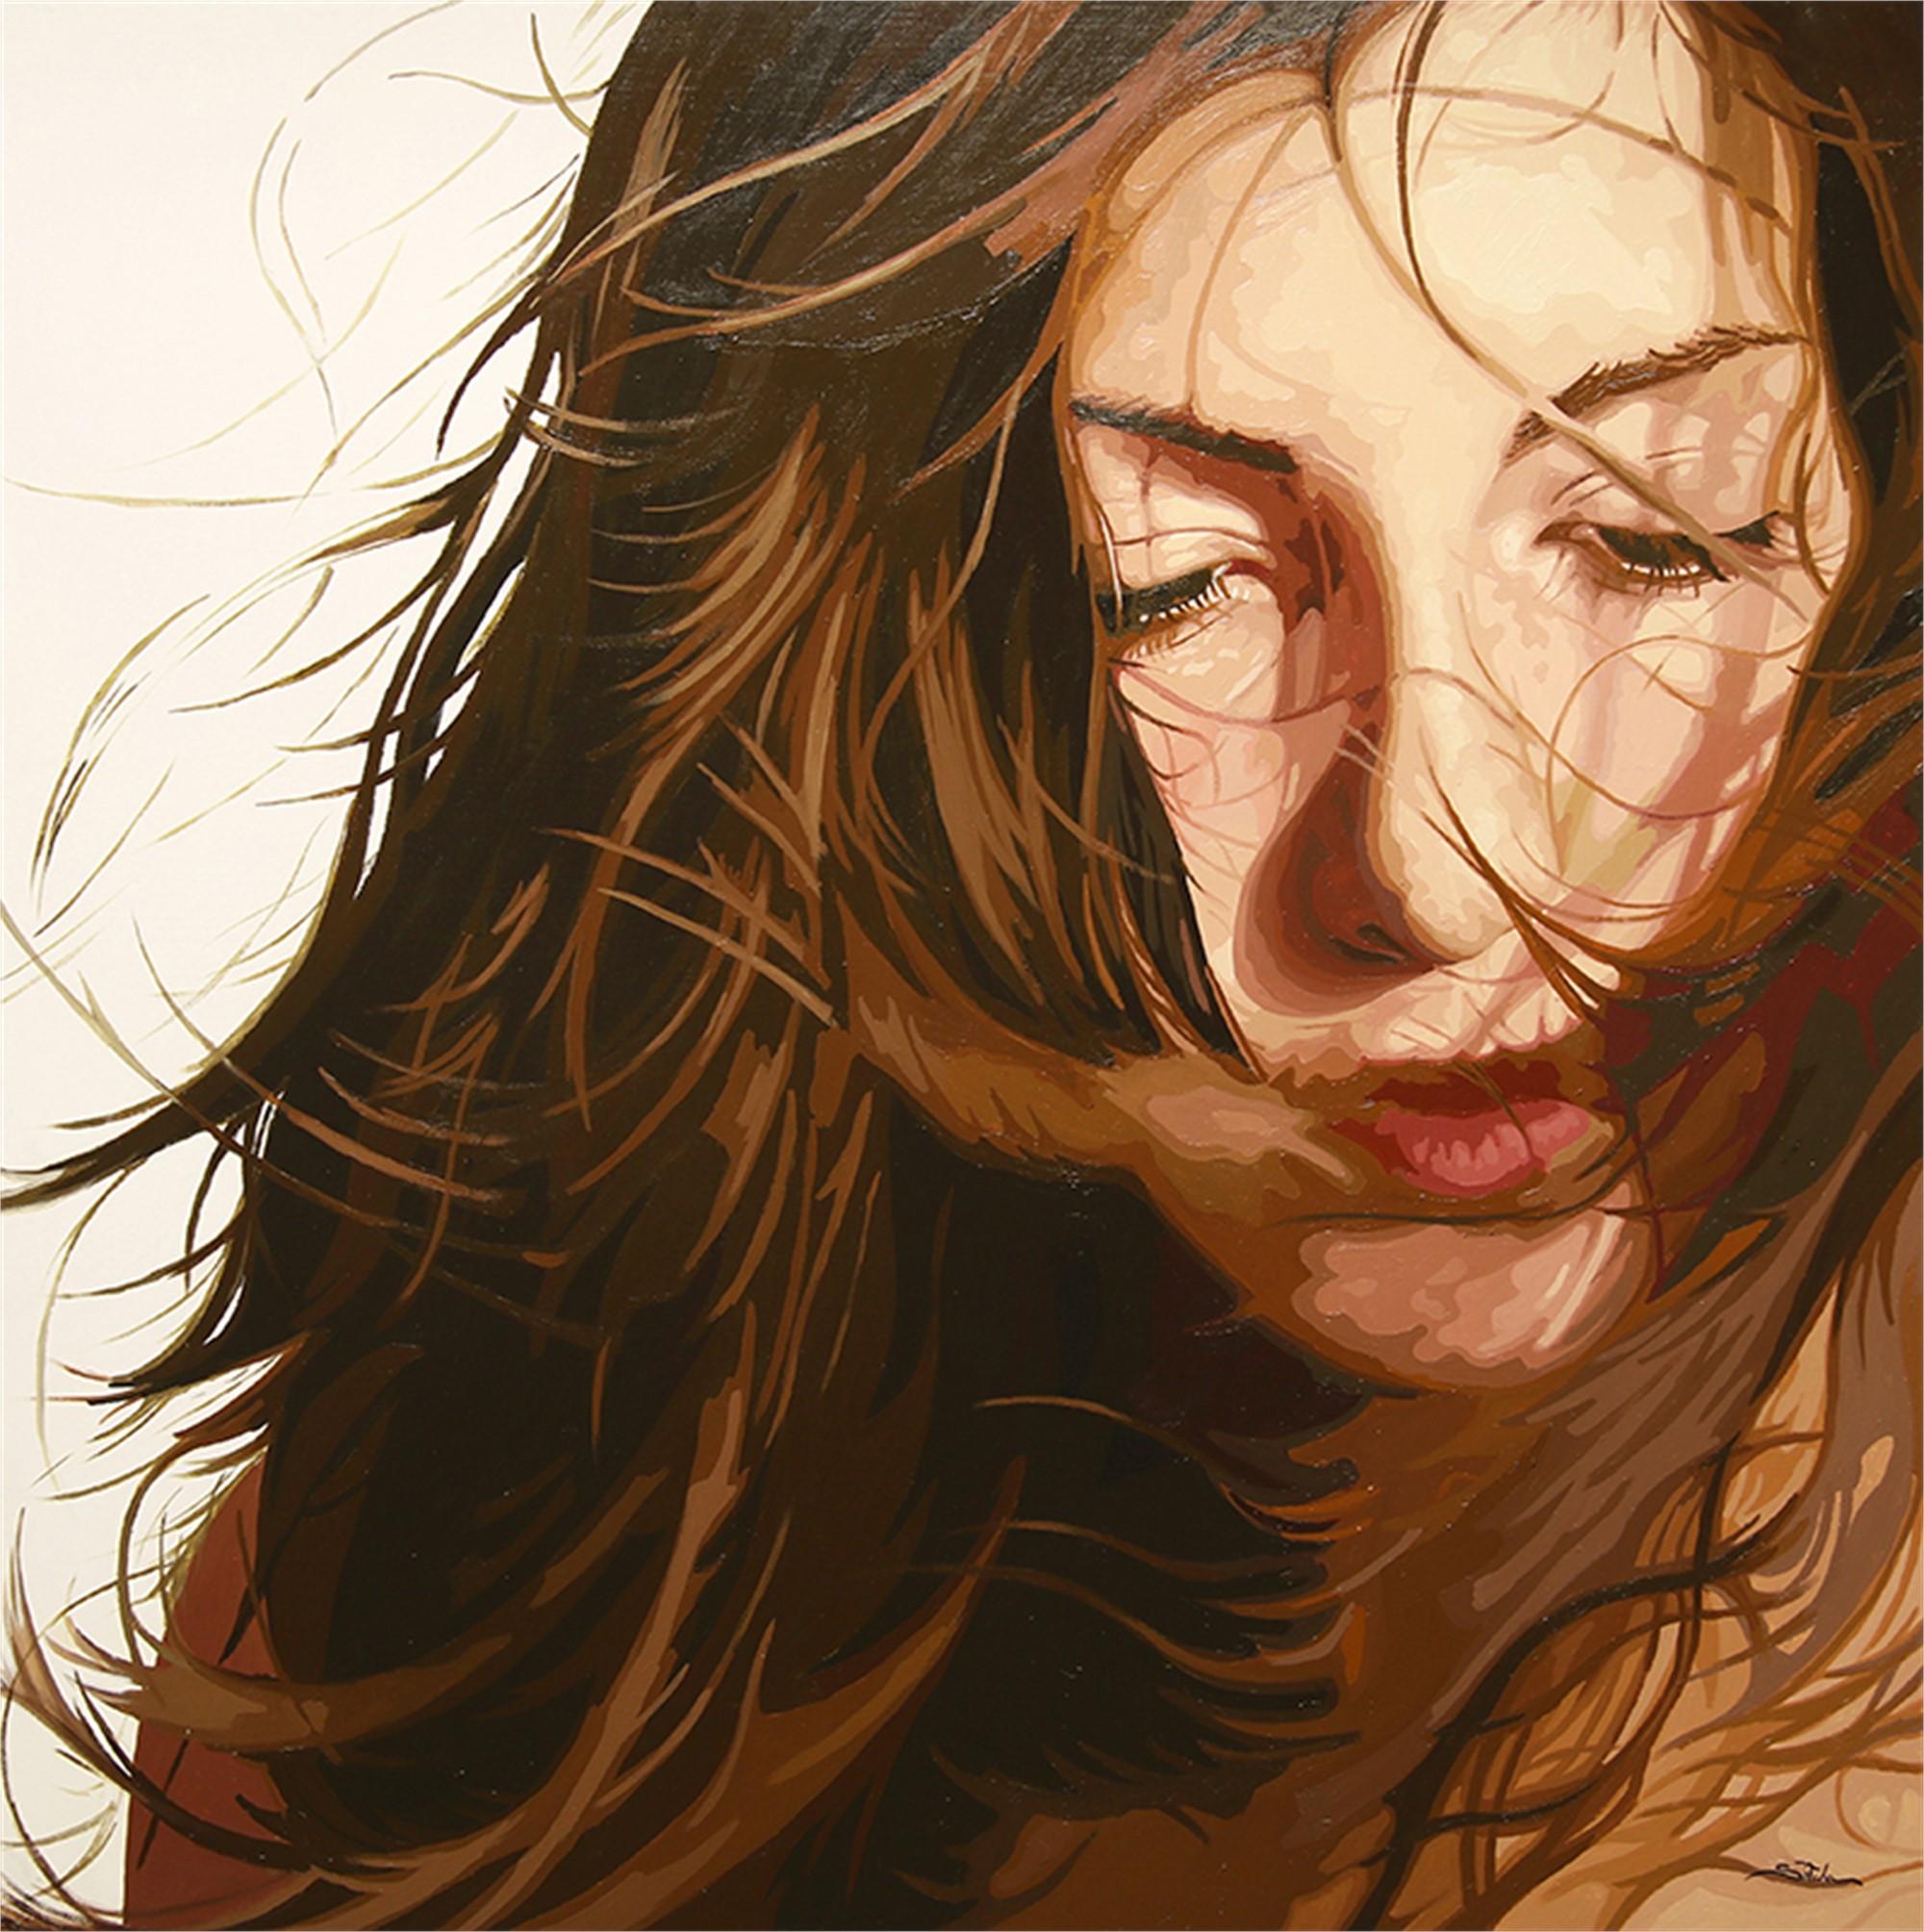 Volatile IV by Rosana Sitcha